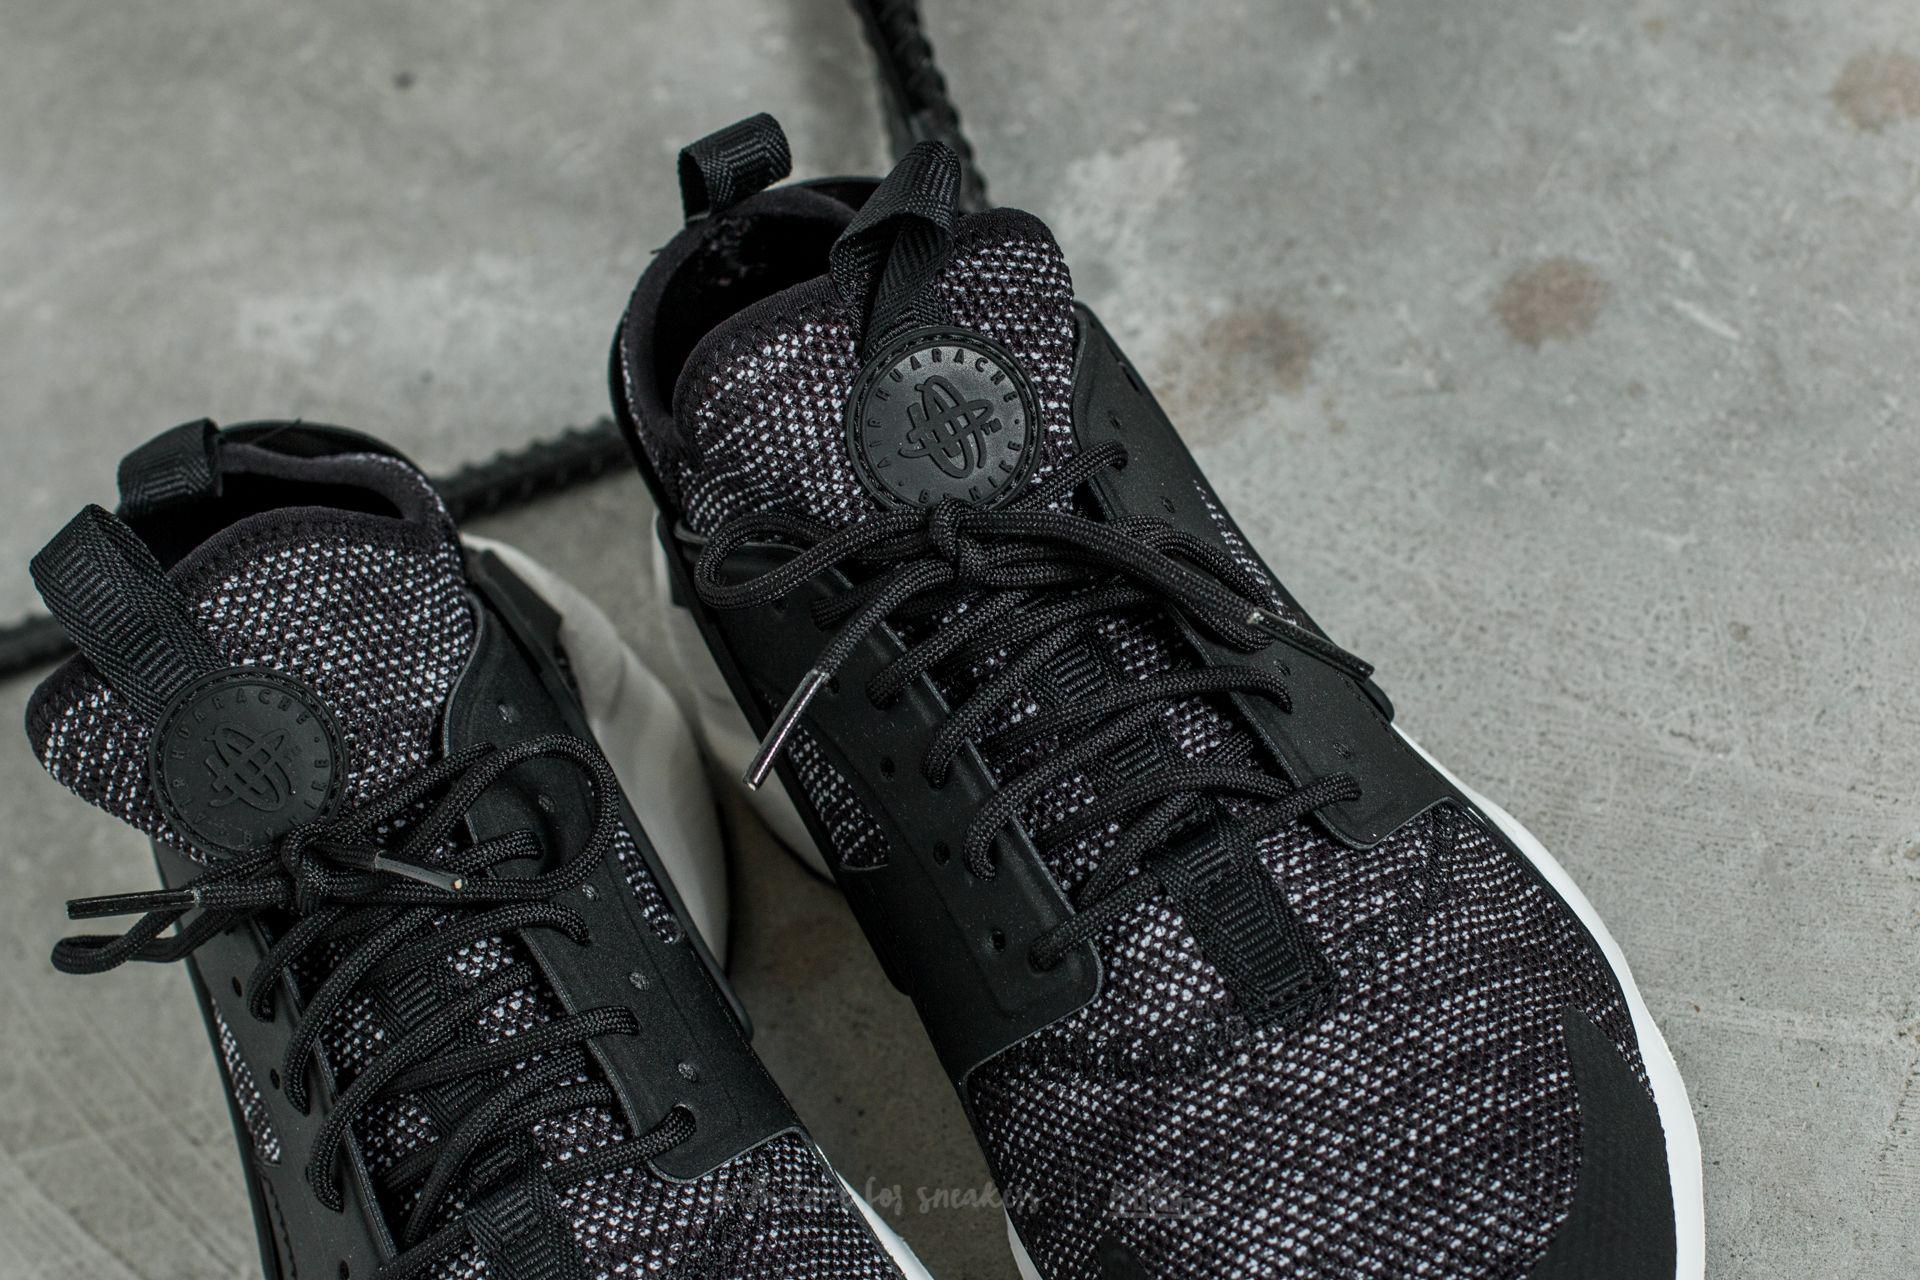 factory price 1f7b8 d0c66 Nike Air Huarache Run Ultra Br Black  Black-summit White in Black ...